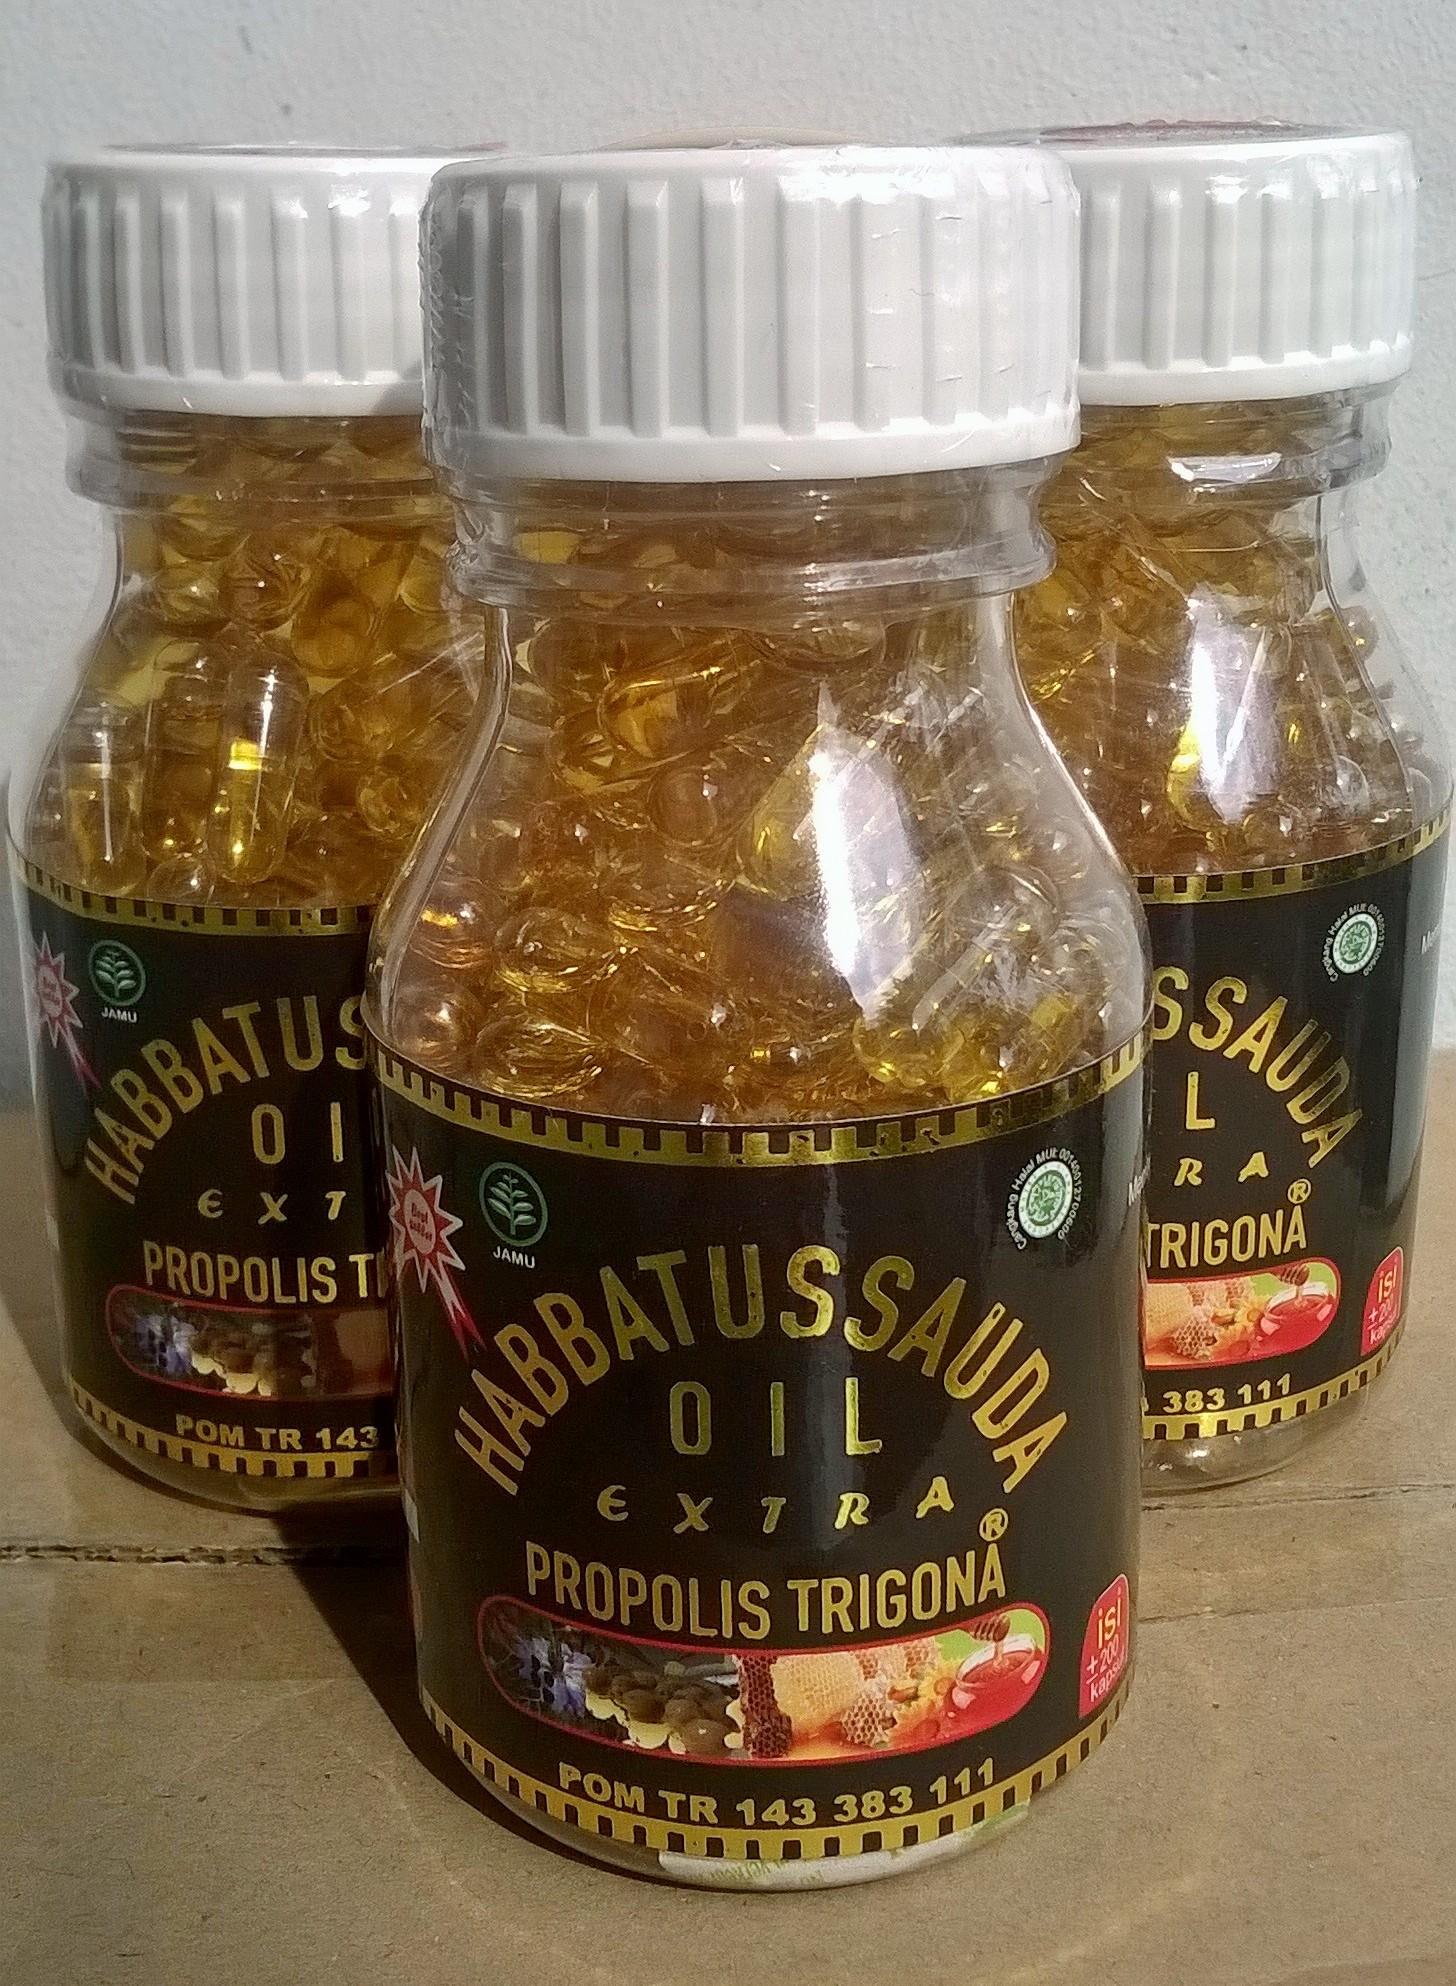 3 Botol Habbatussauda Oil Extra Propolis Trigona 1 Isi 200 Kamil In Kapsul Lazada Source